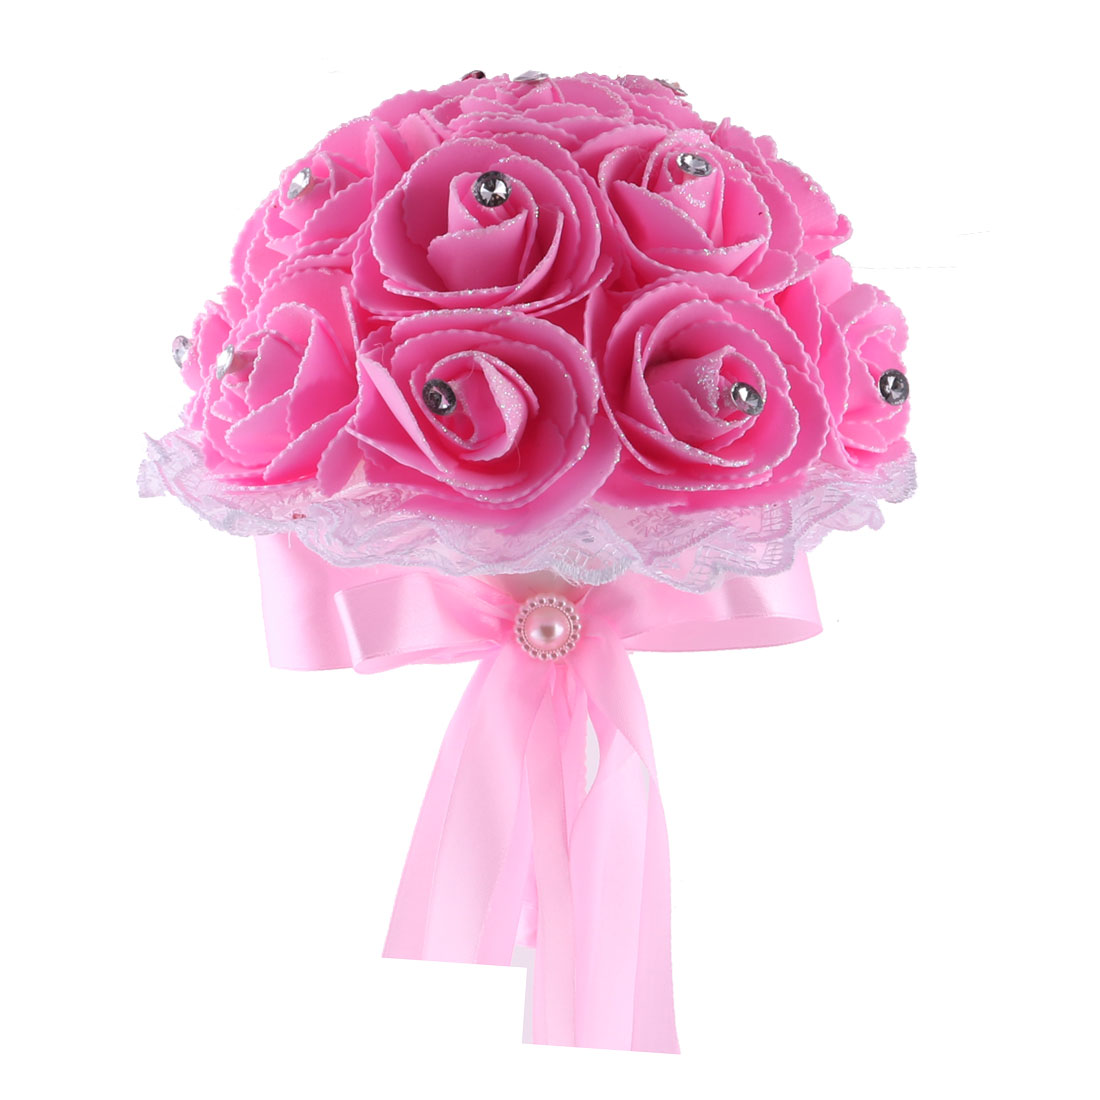 Wedding Banquet Bridal Foam Rose Buds Handhold Artificial Bouquet Craft Ornament Pink